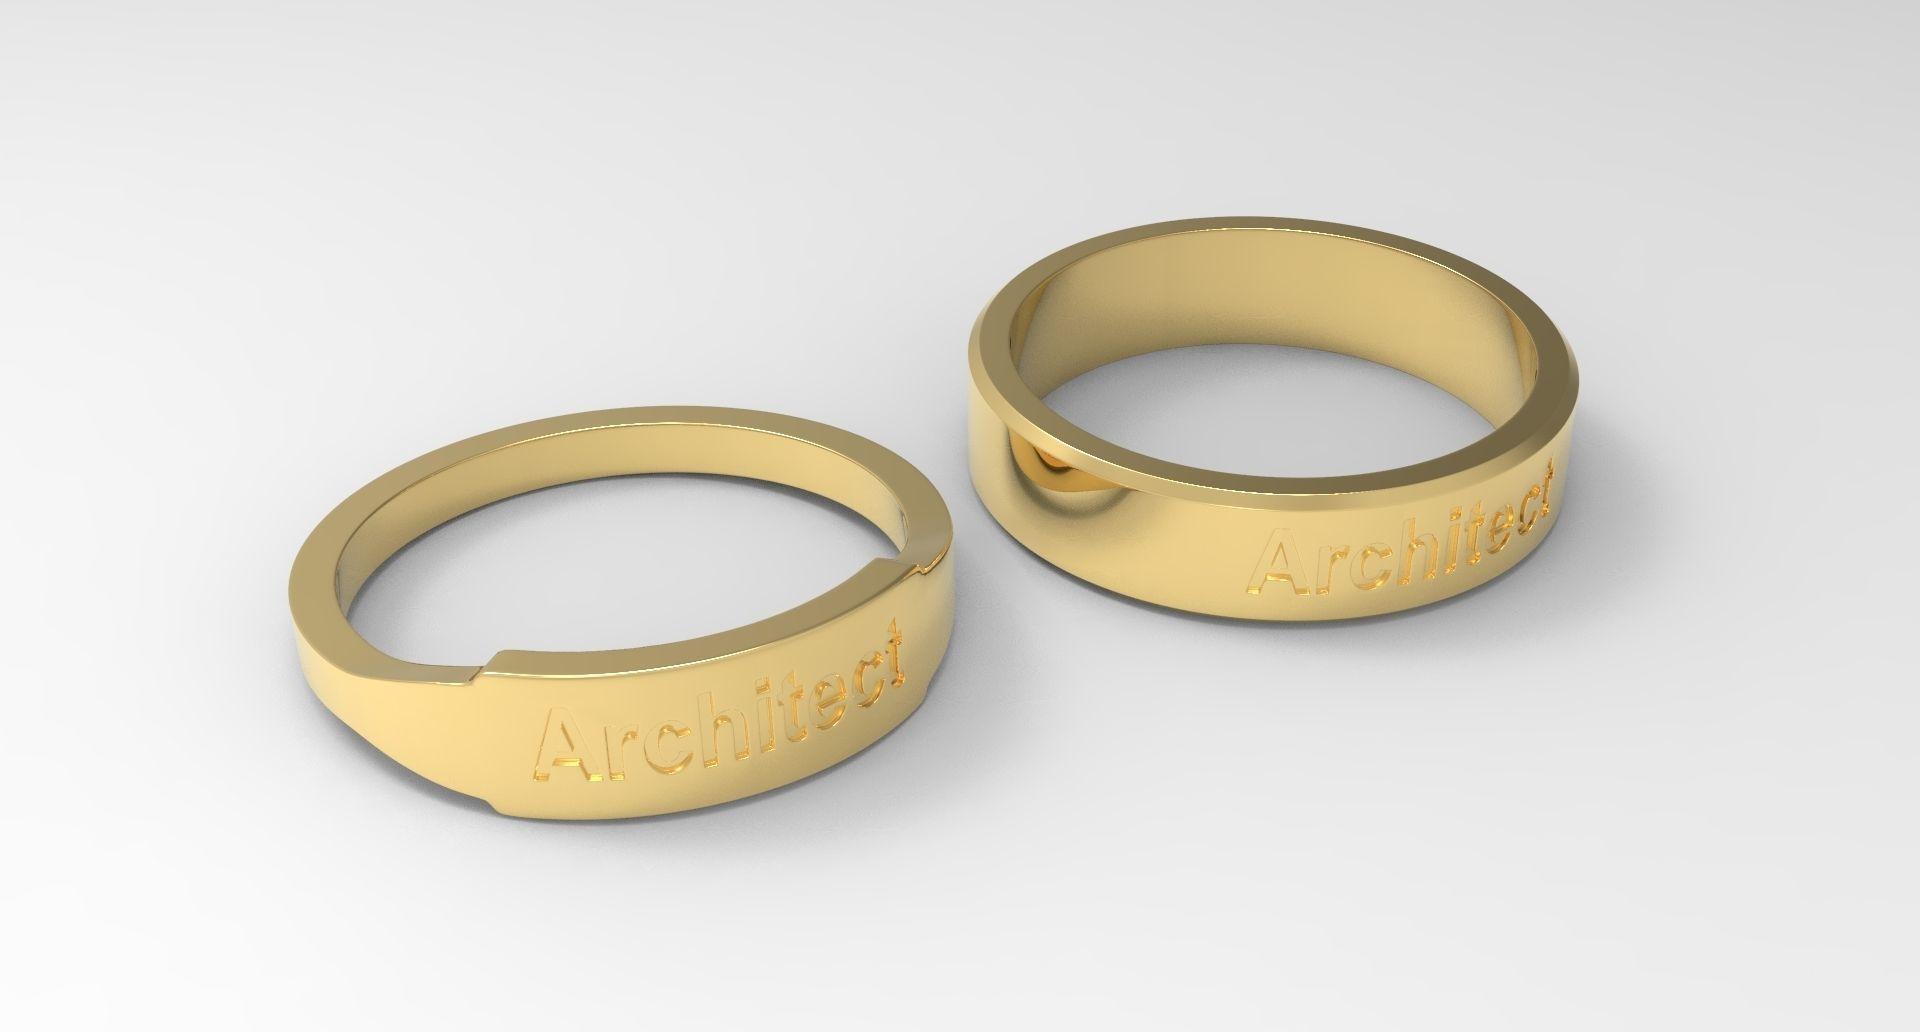 Architect Couple Ring Gold